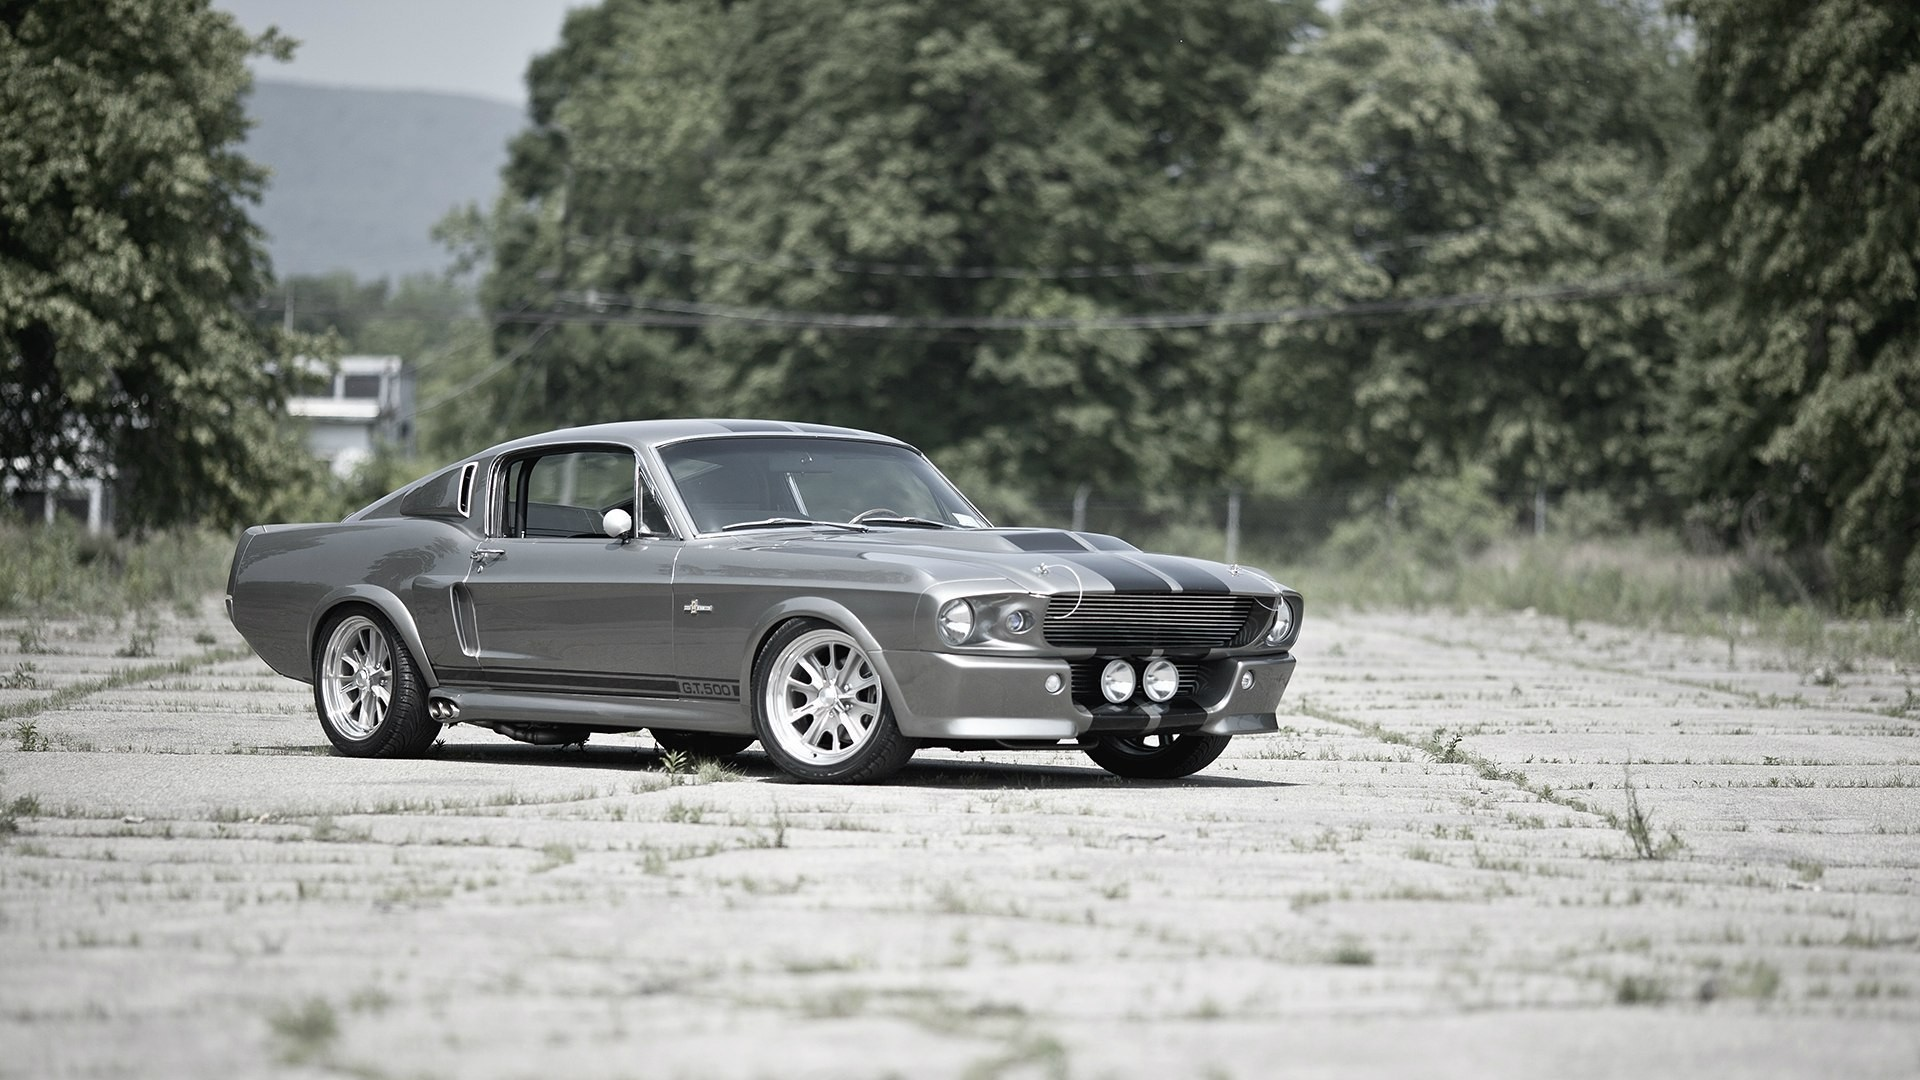 Wallpaper Abyss Erkunden Sie die Sammlung Ford Mustang Mustang 289241 .